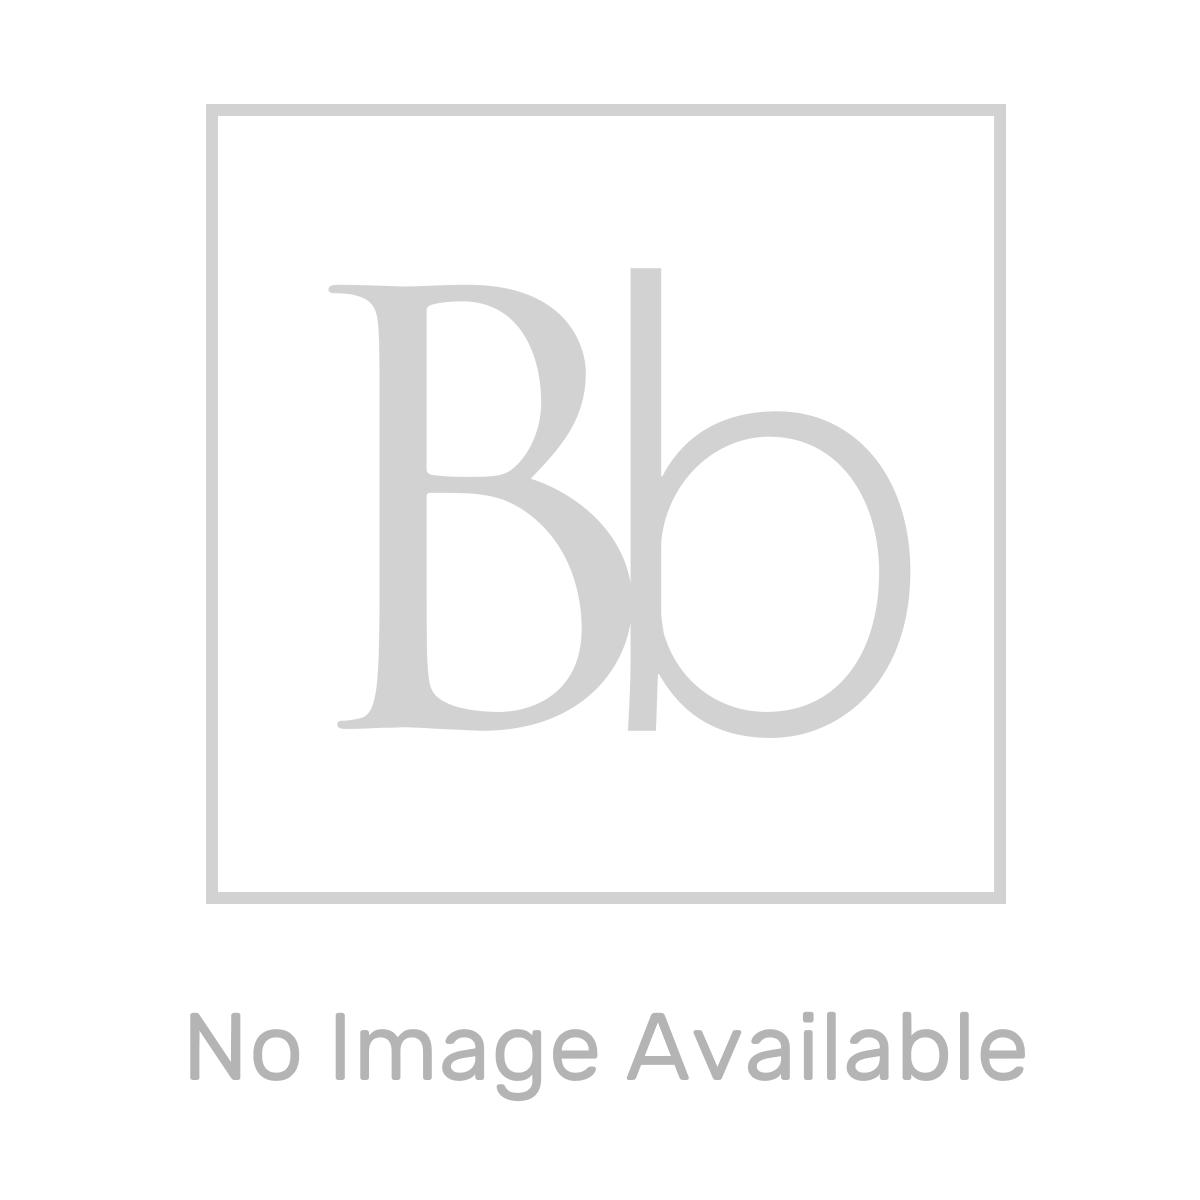 Nuie Athena Natural Oak 2 Drawer Floor Standing Vanity Unit with 18mm Worktop 600mm Line Drawing